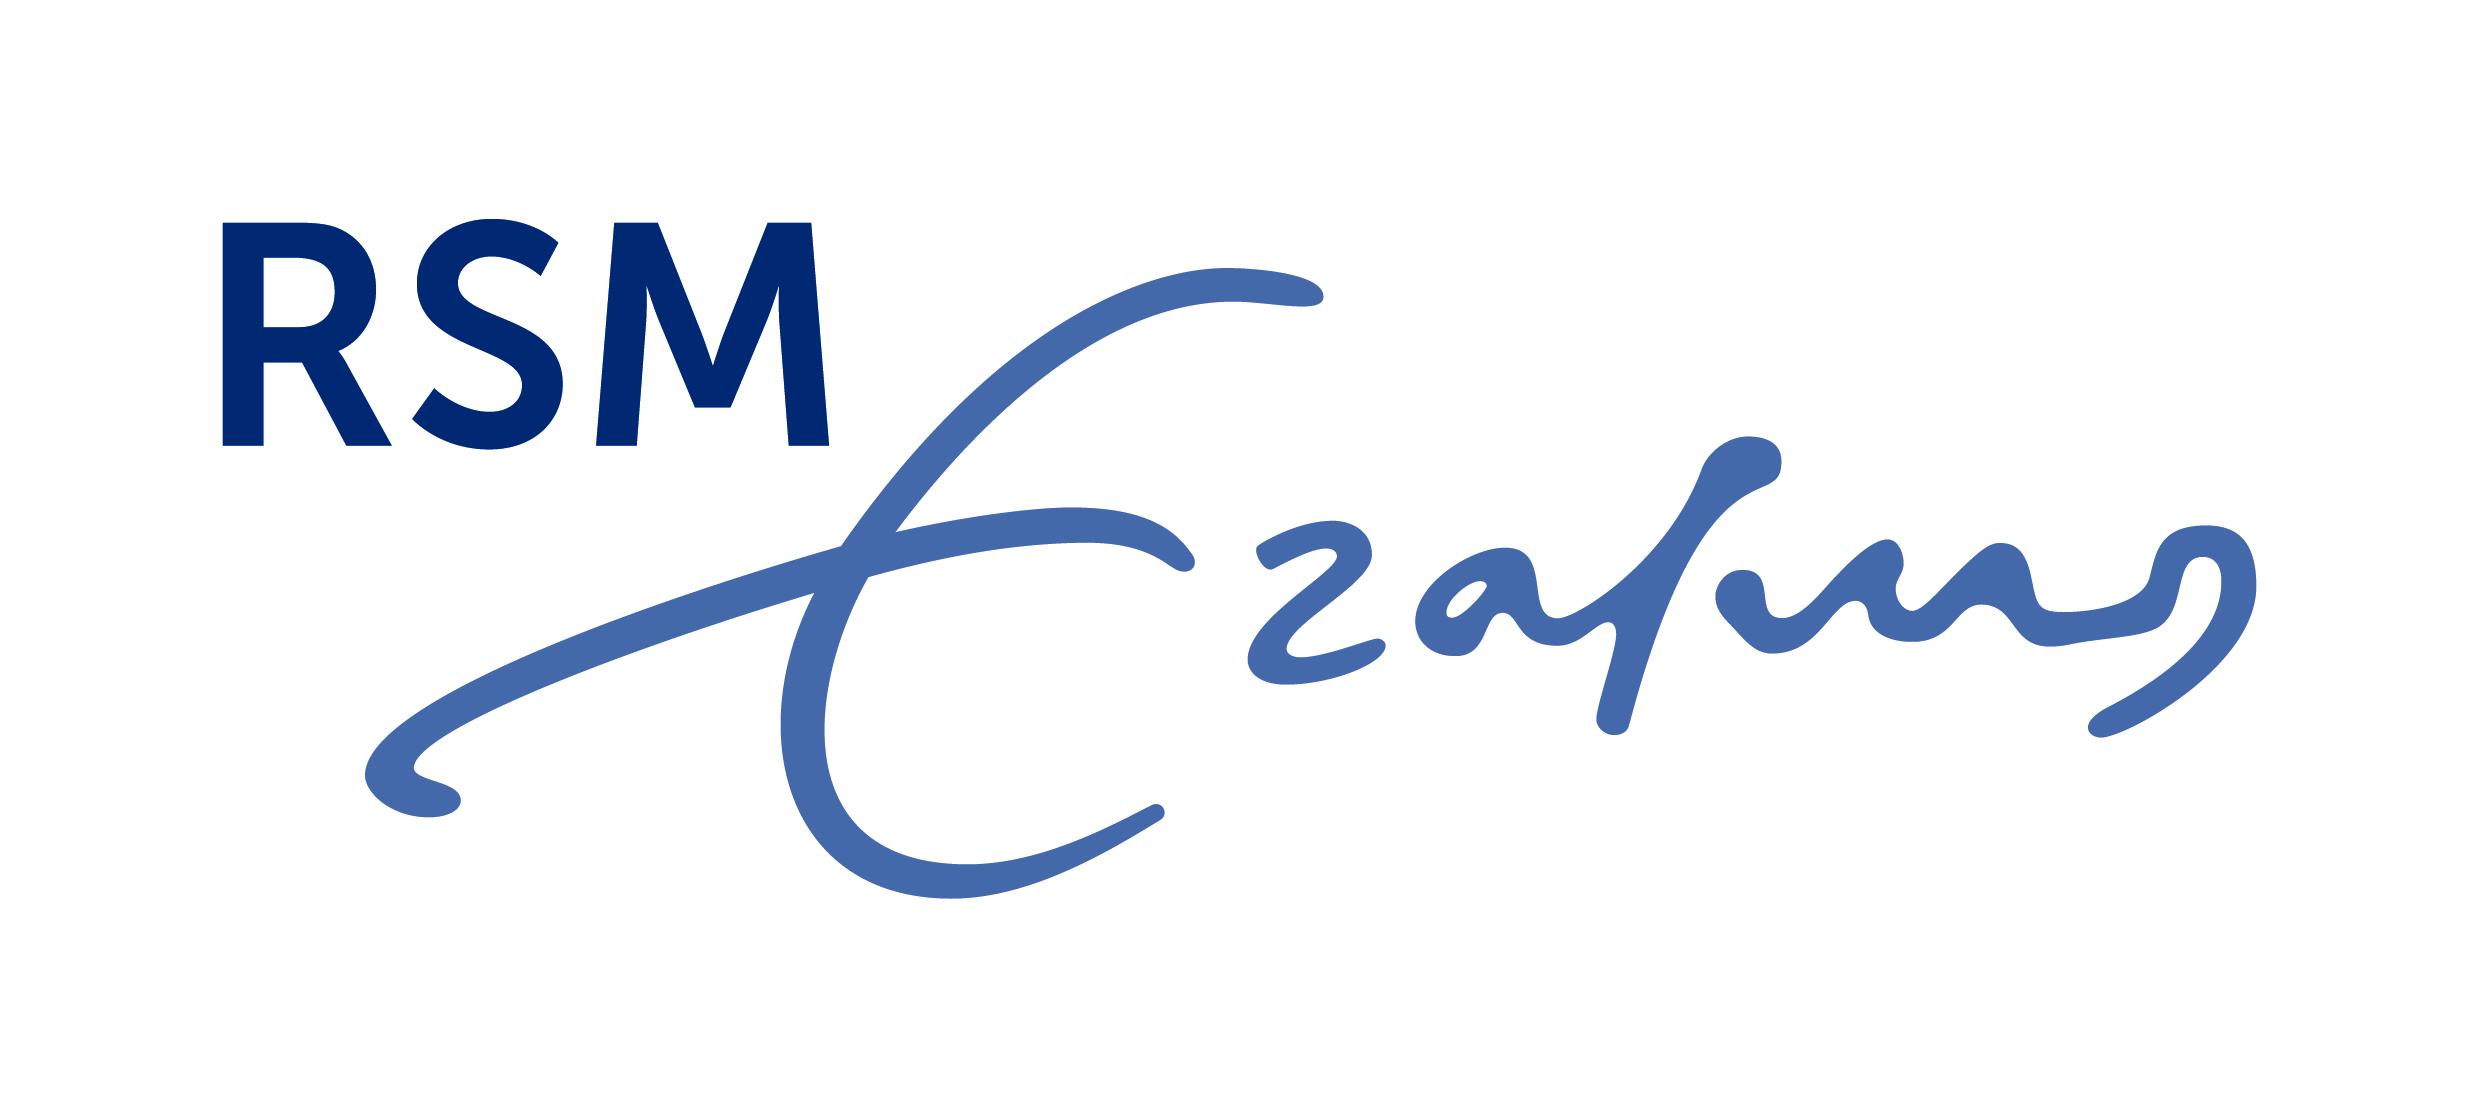 RSM Erasmus